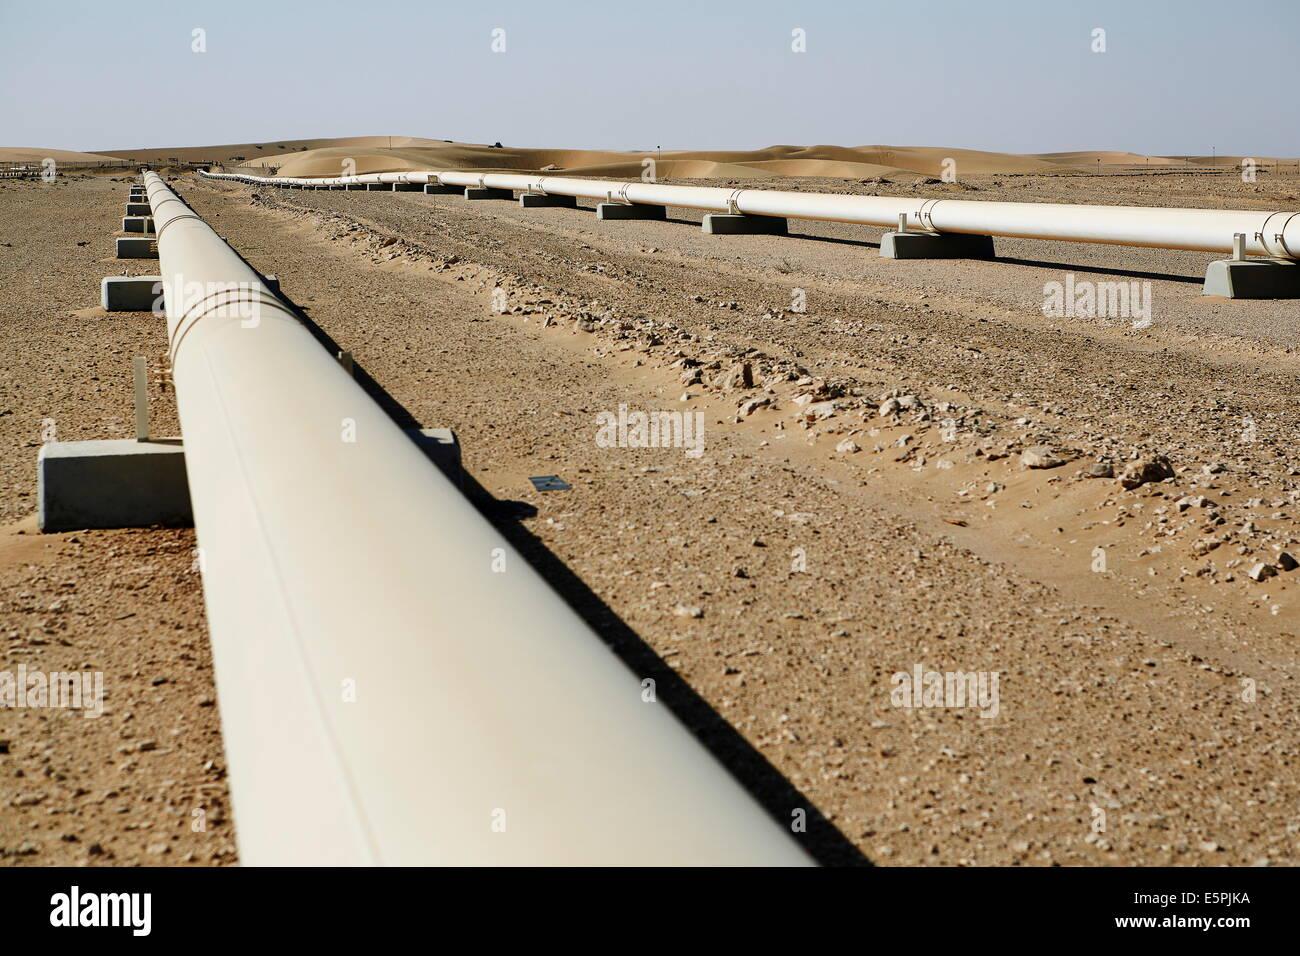 Crude Oil Line in the Qatari desert, Qatar, Middle East - Stock Image